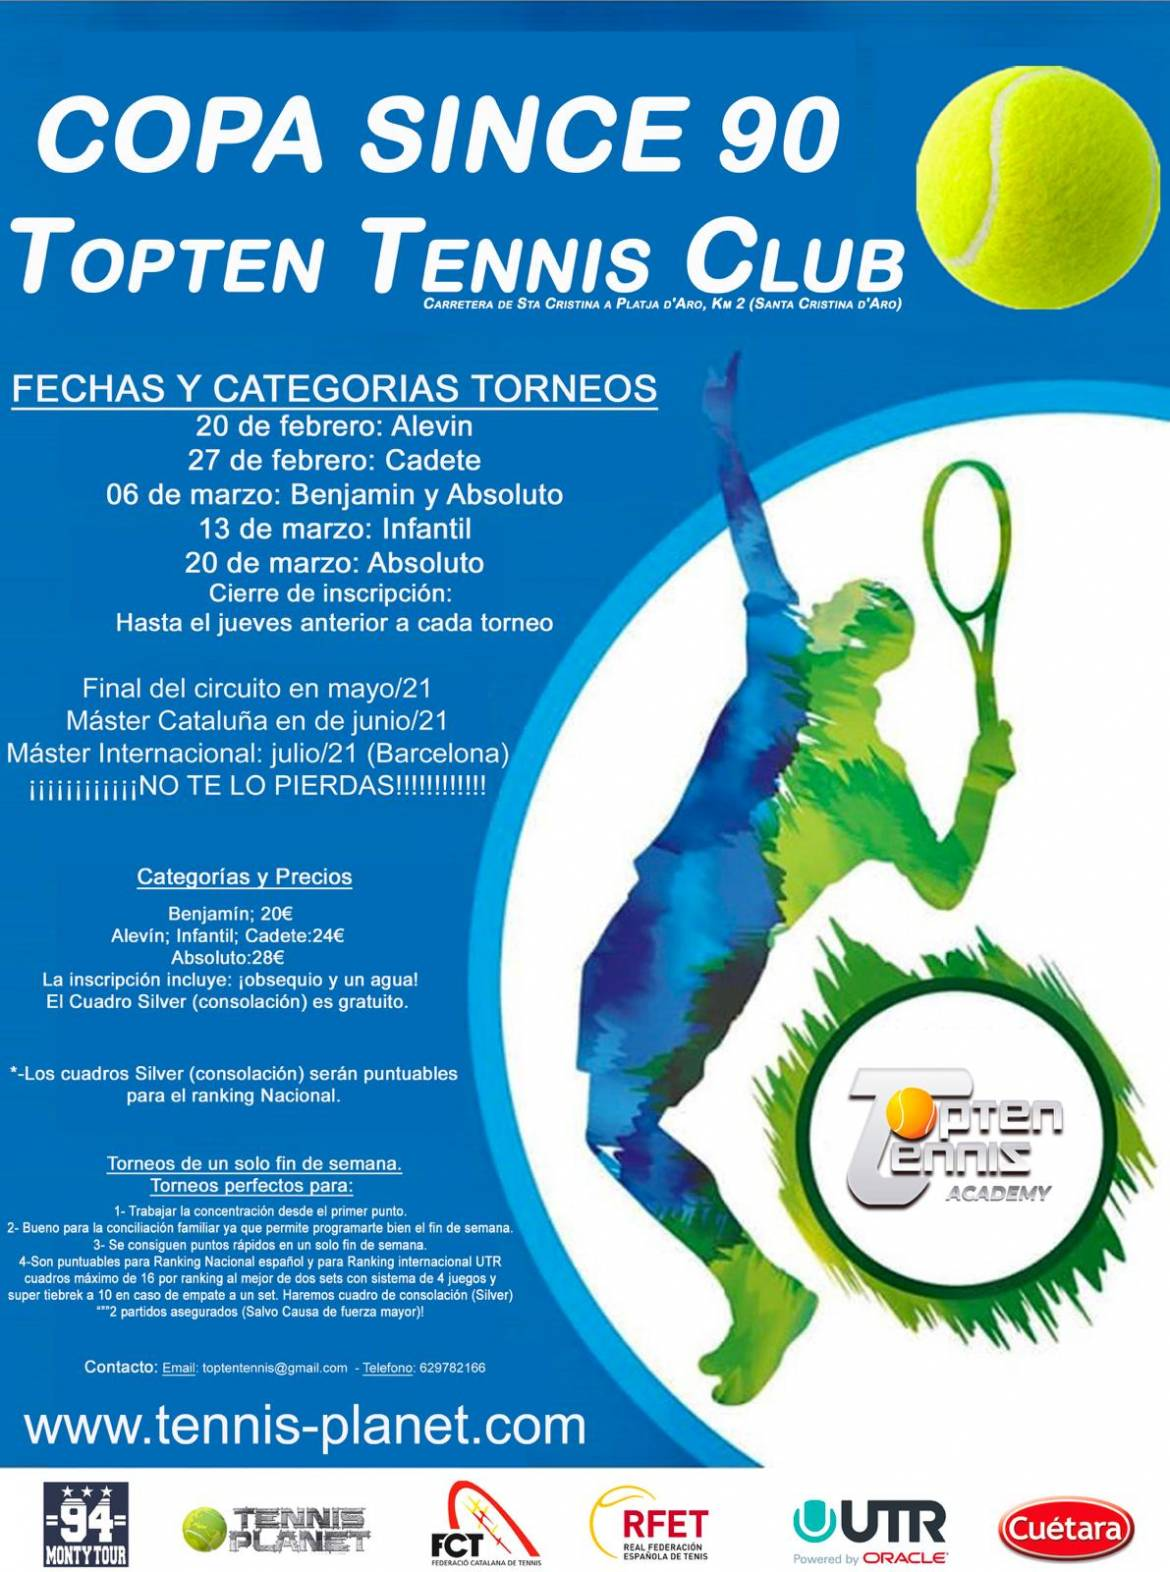 COPA-SINCE-90-TOPTEN-TENNIS-CLUB.jpg